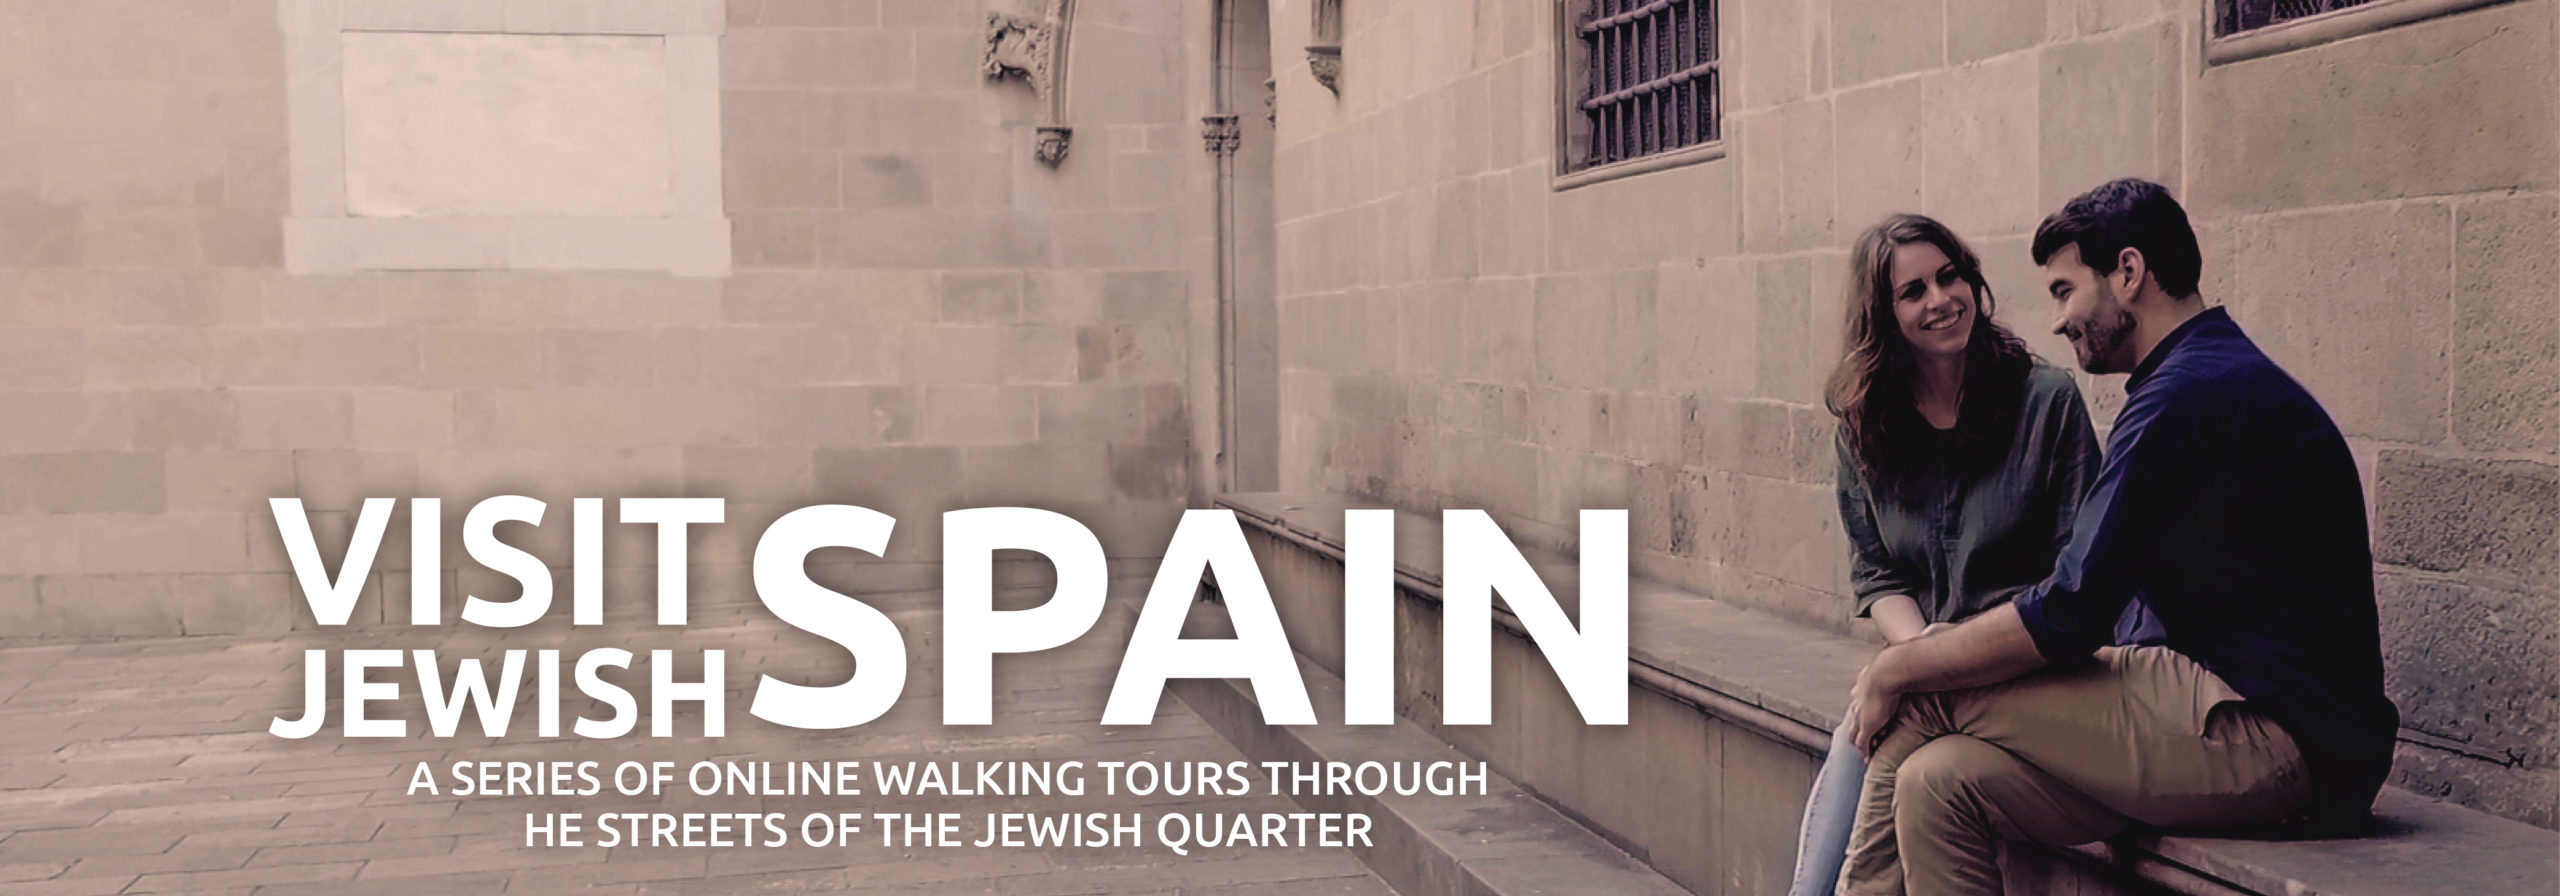 Visit Jewish Spain Hompage image